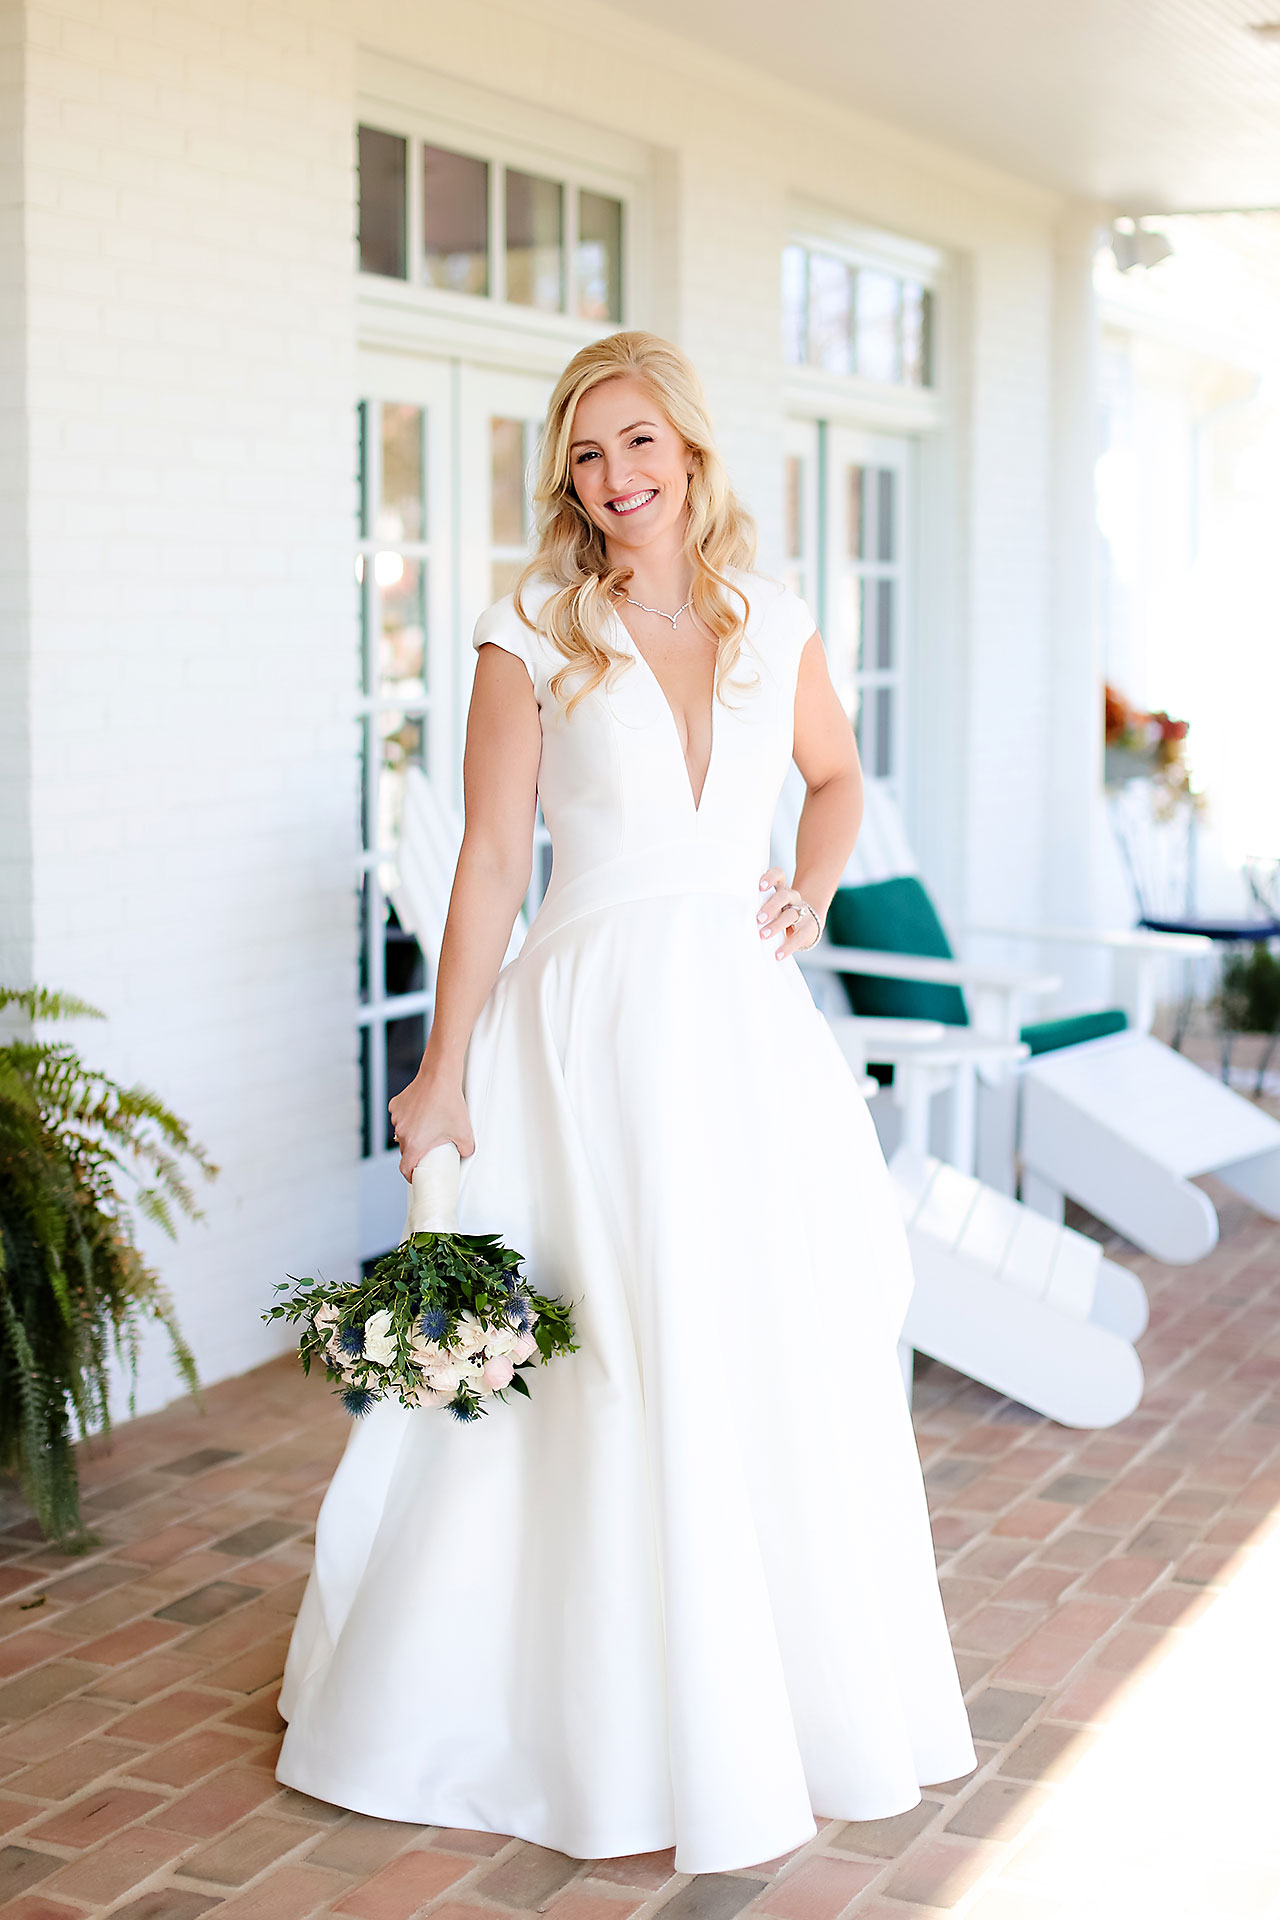 Ashley Steve Bloomington Indiana Wedding 080